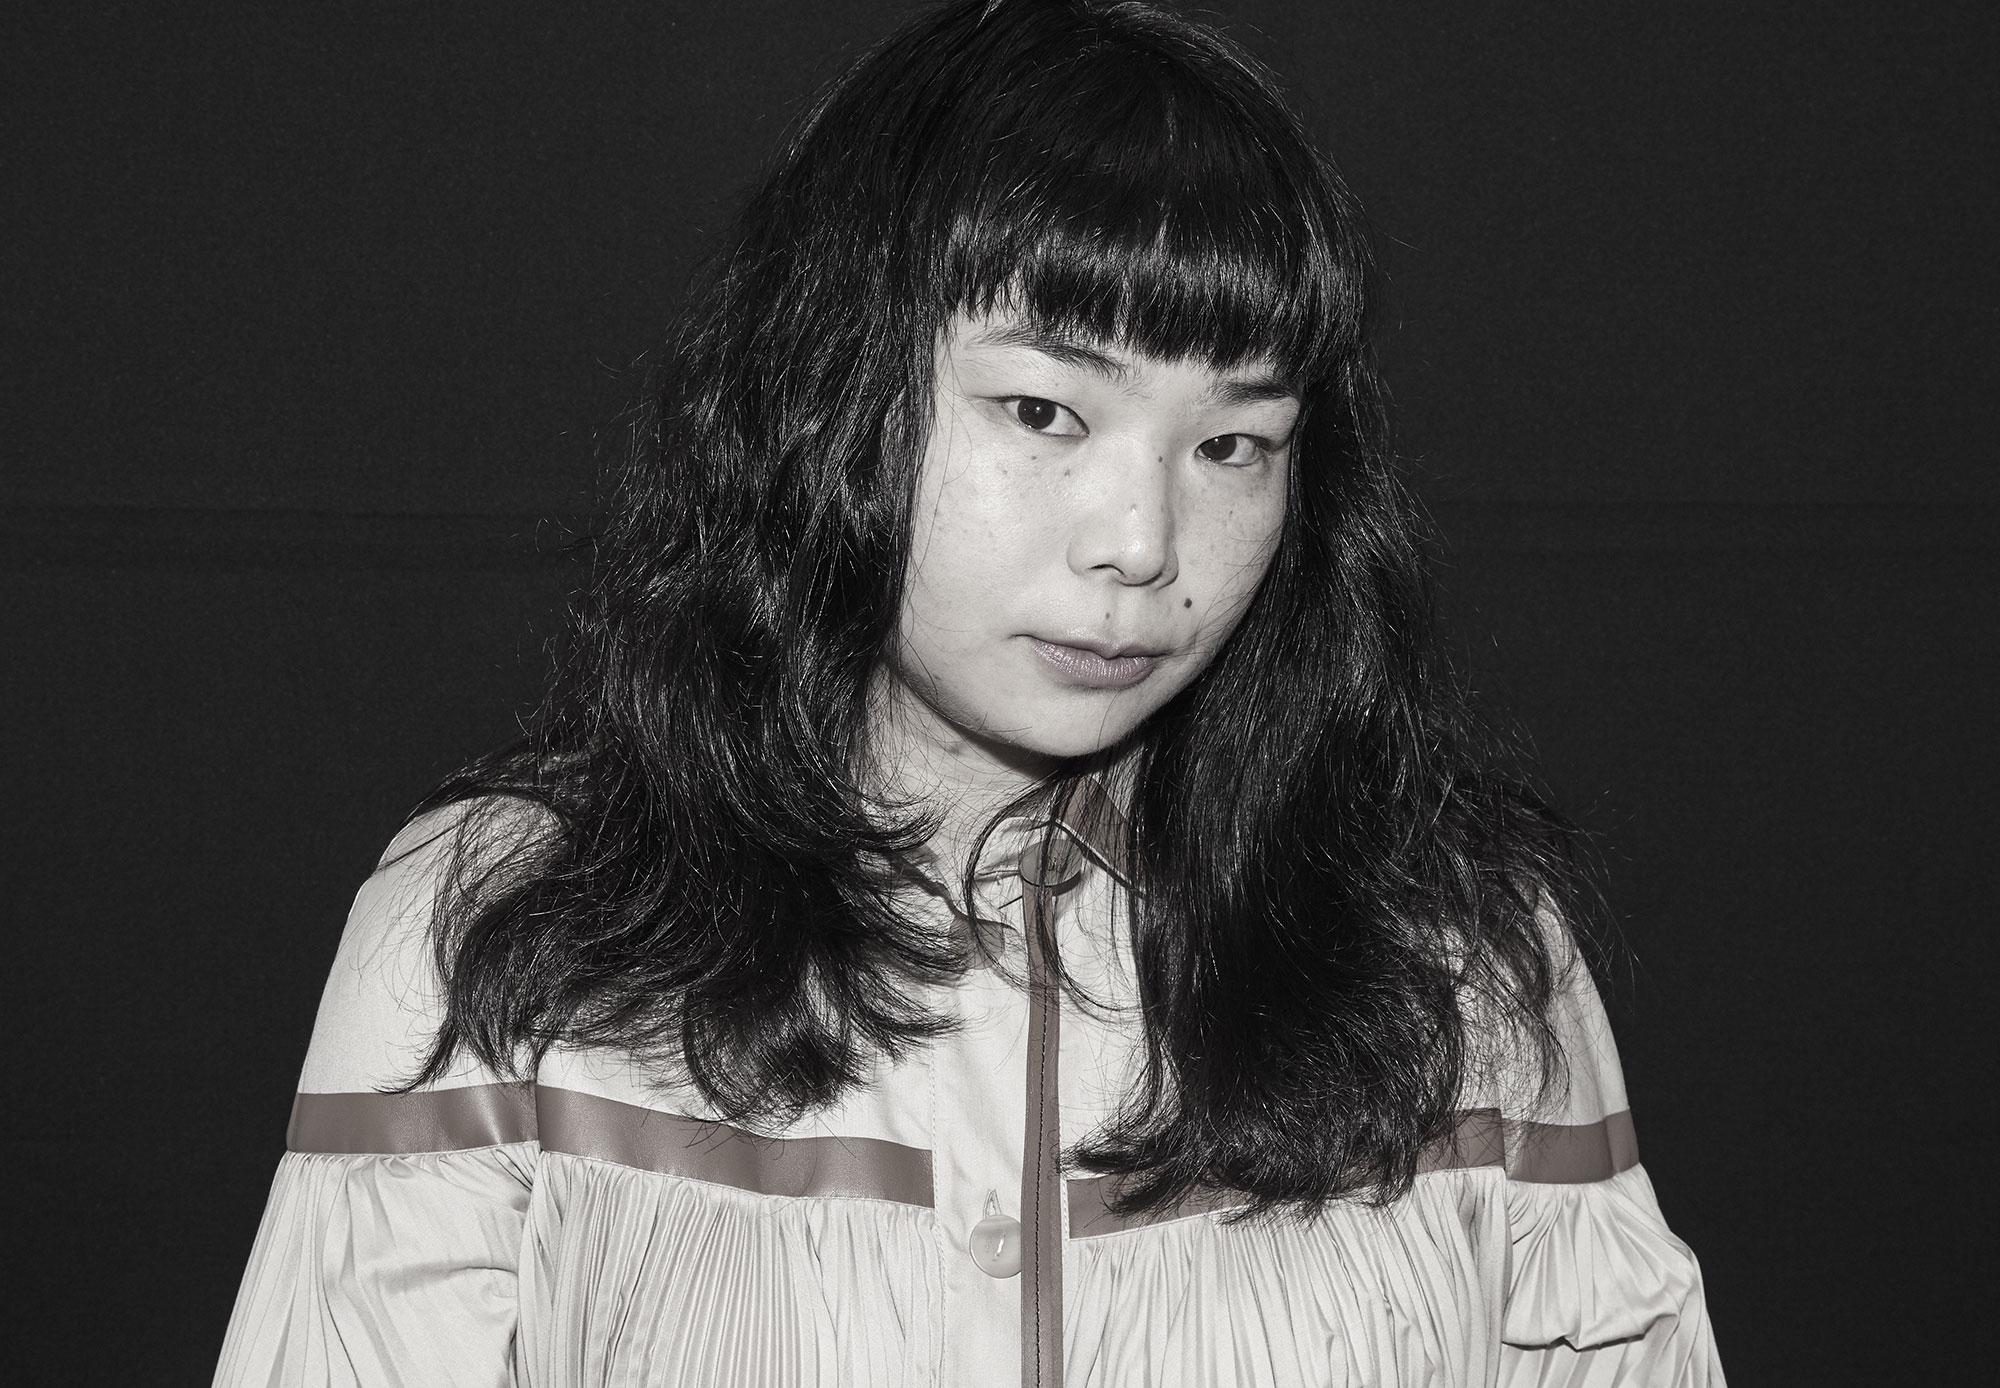 Photo by Eriko Nemoto